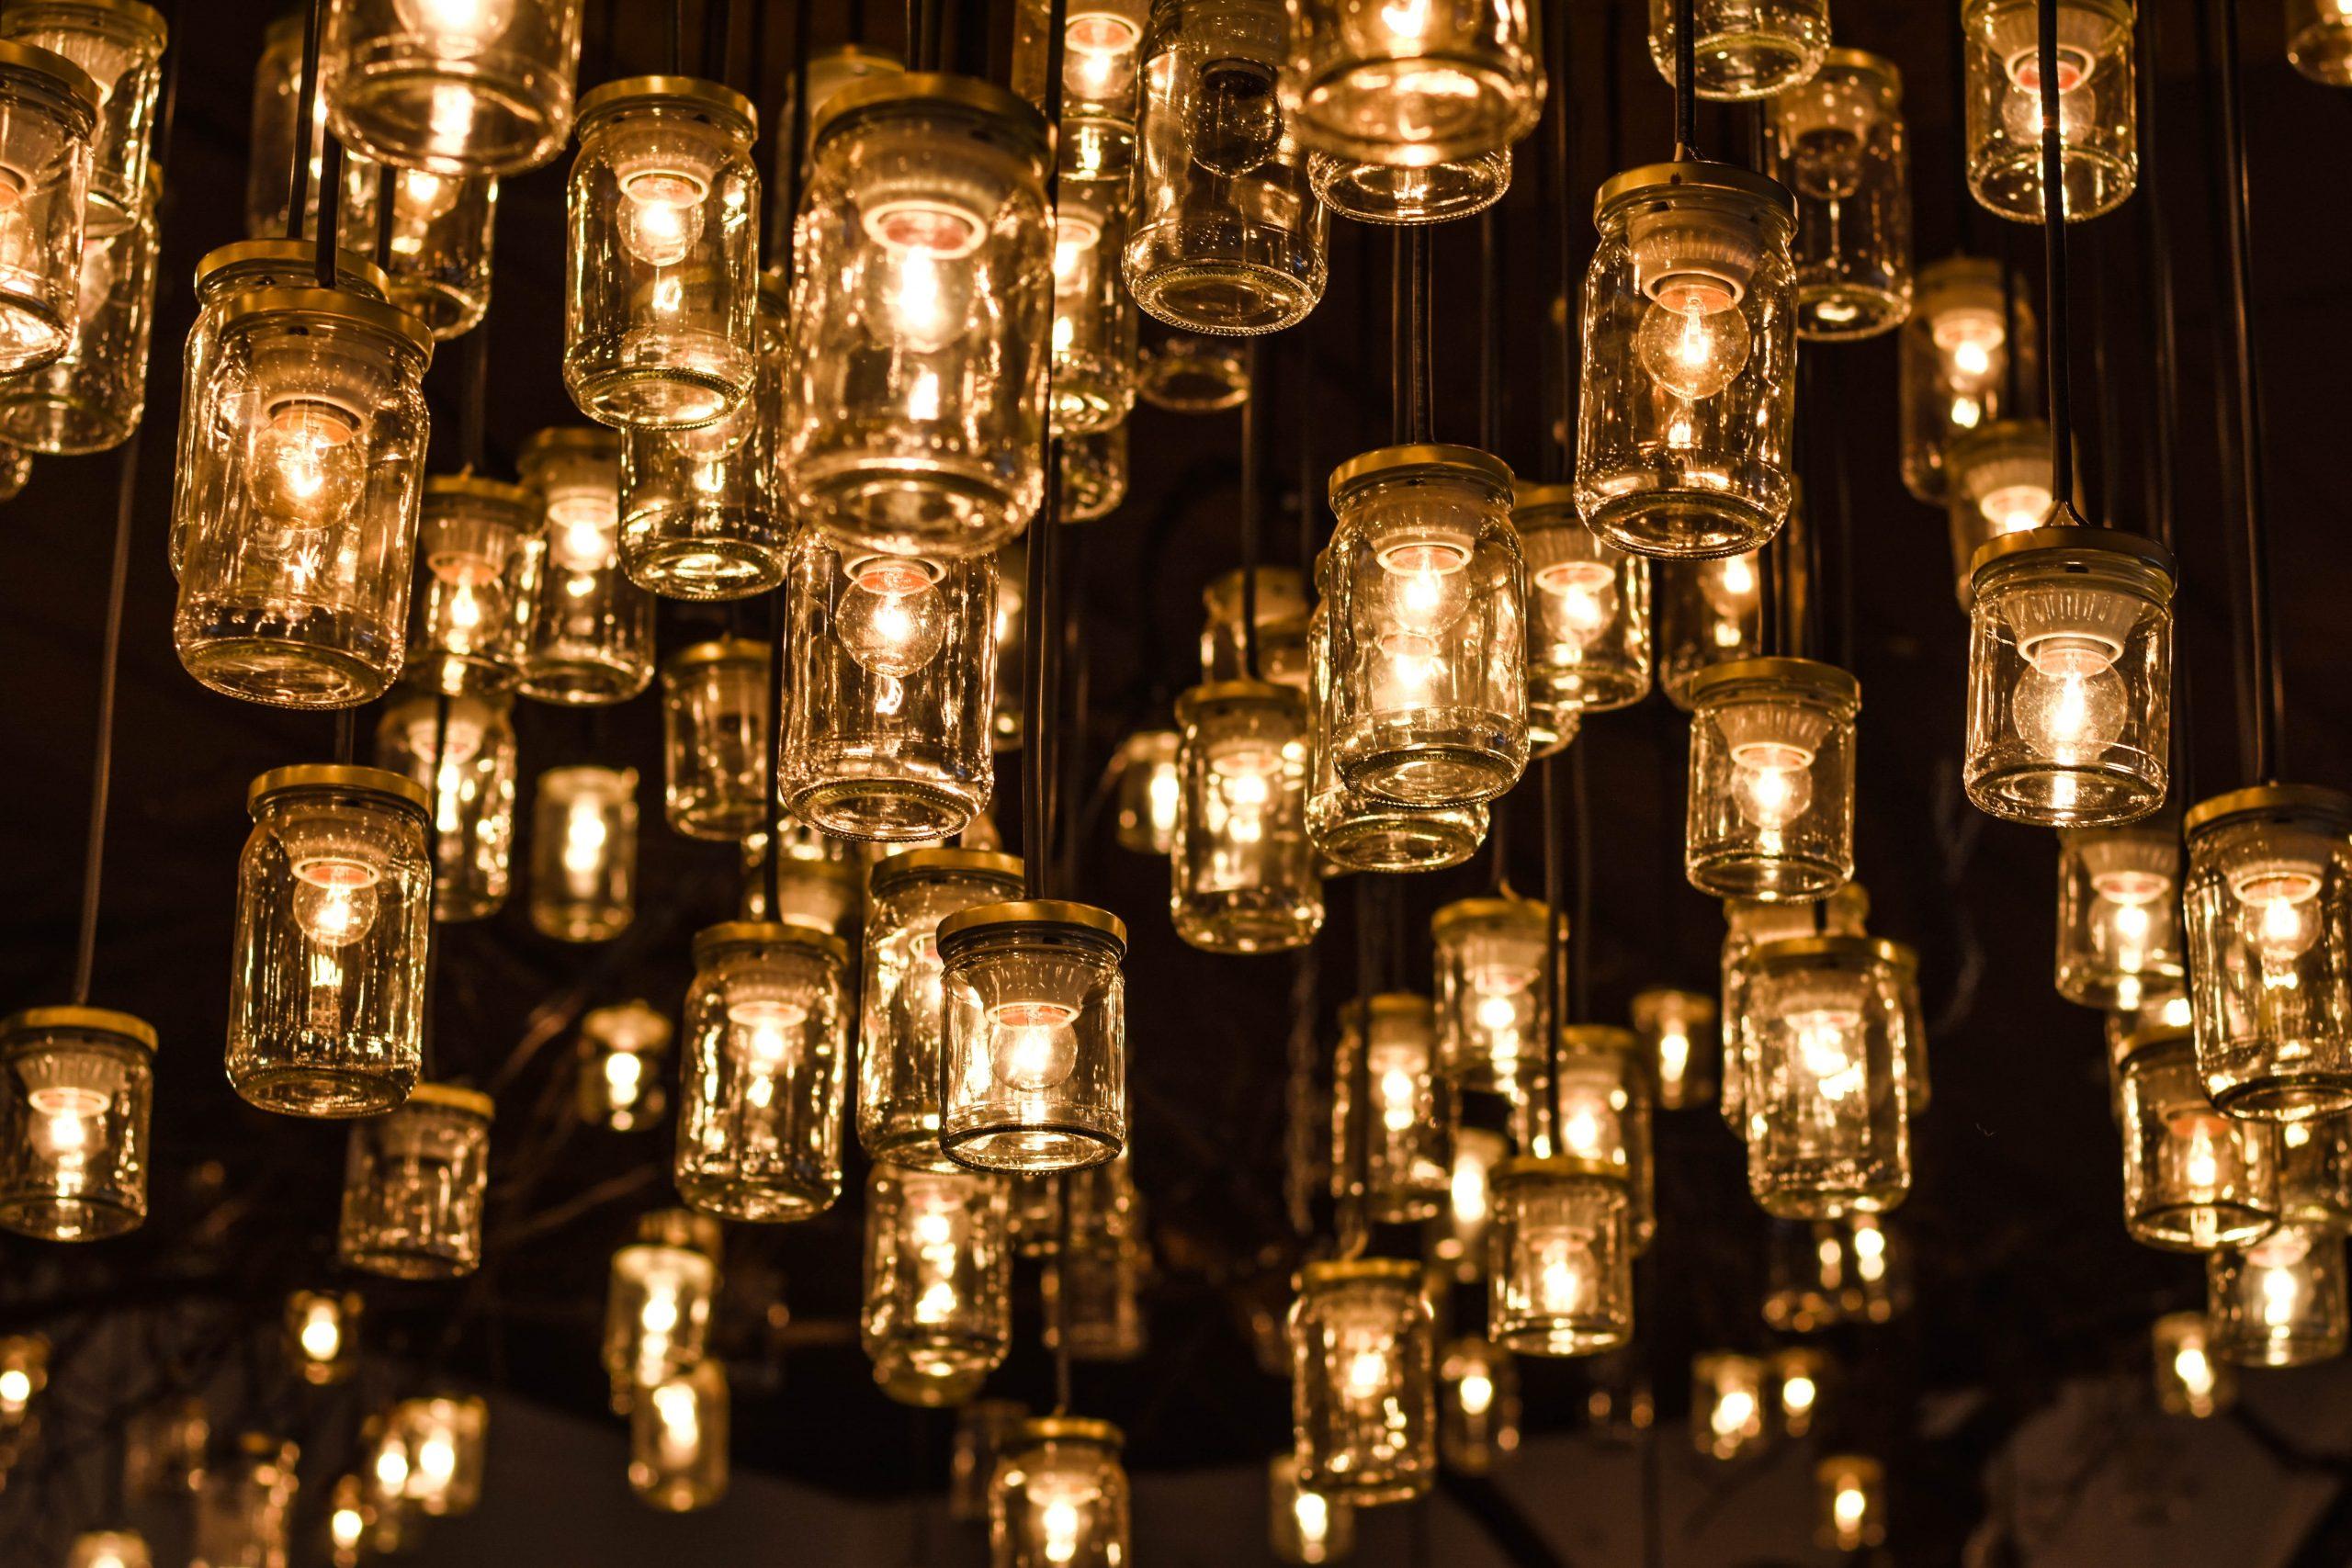 image of lights in jars